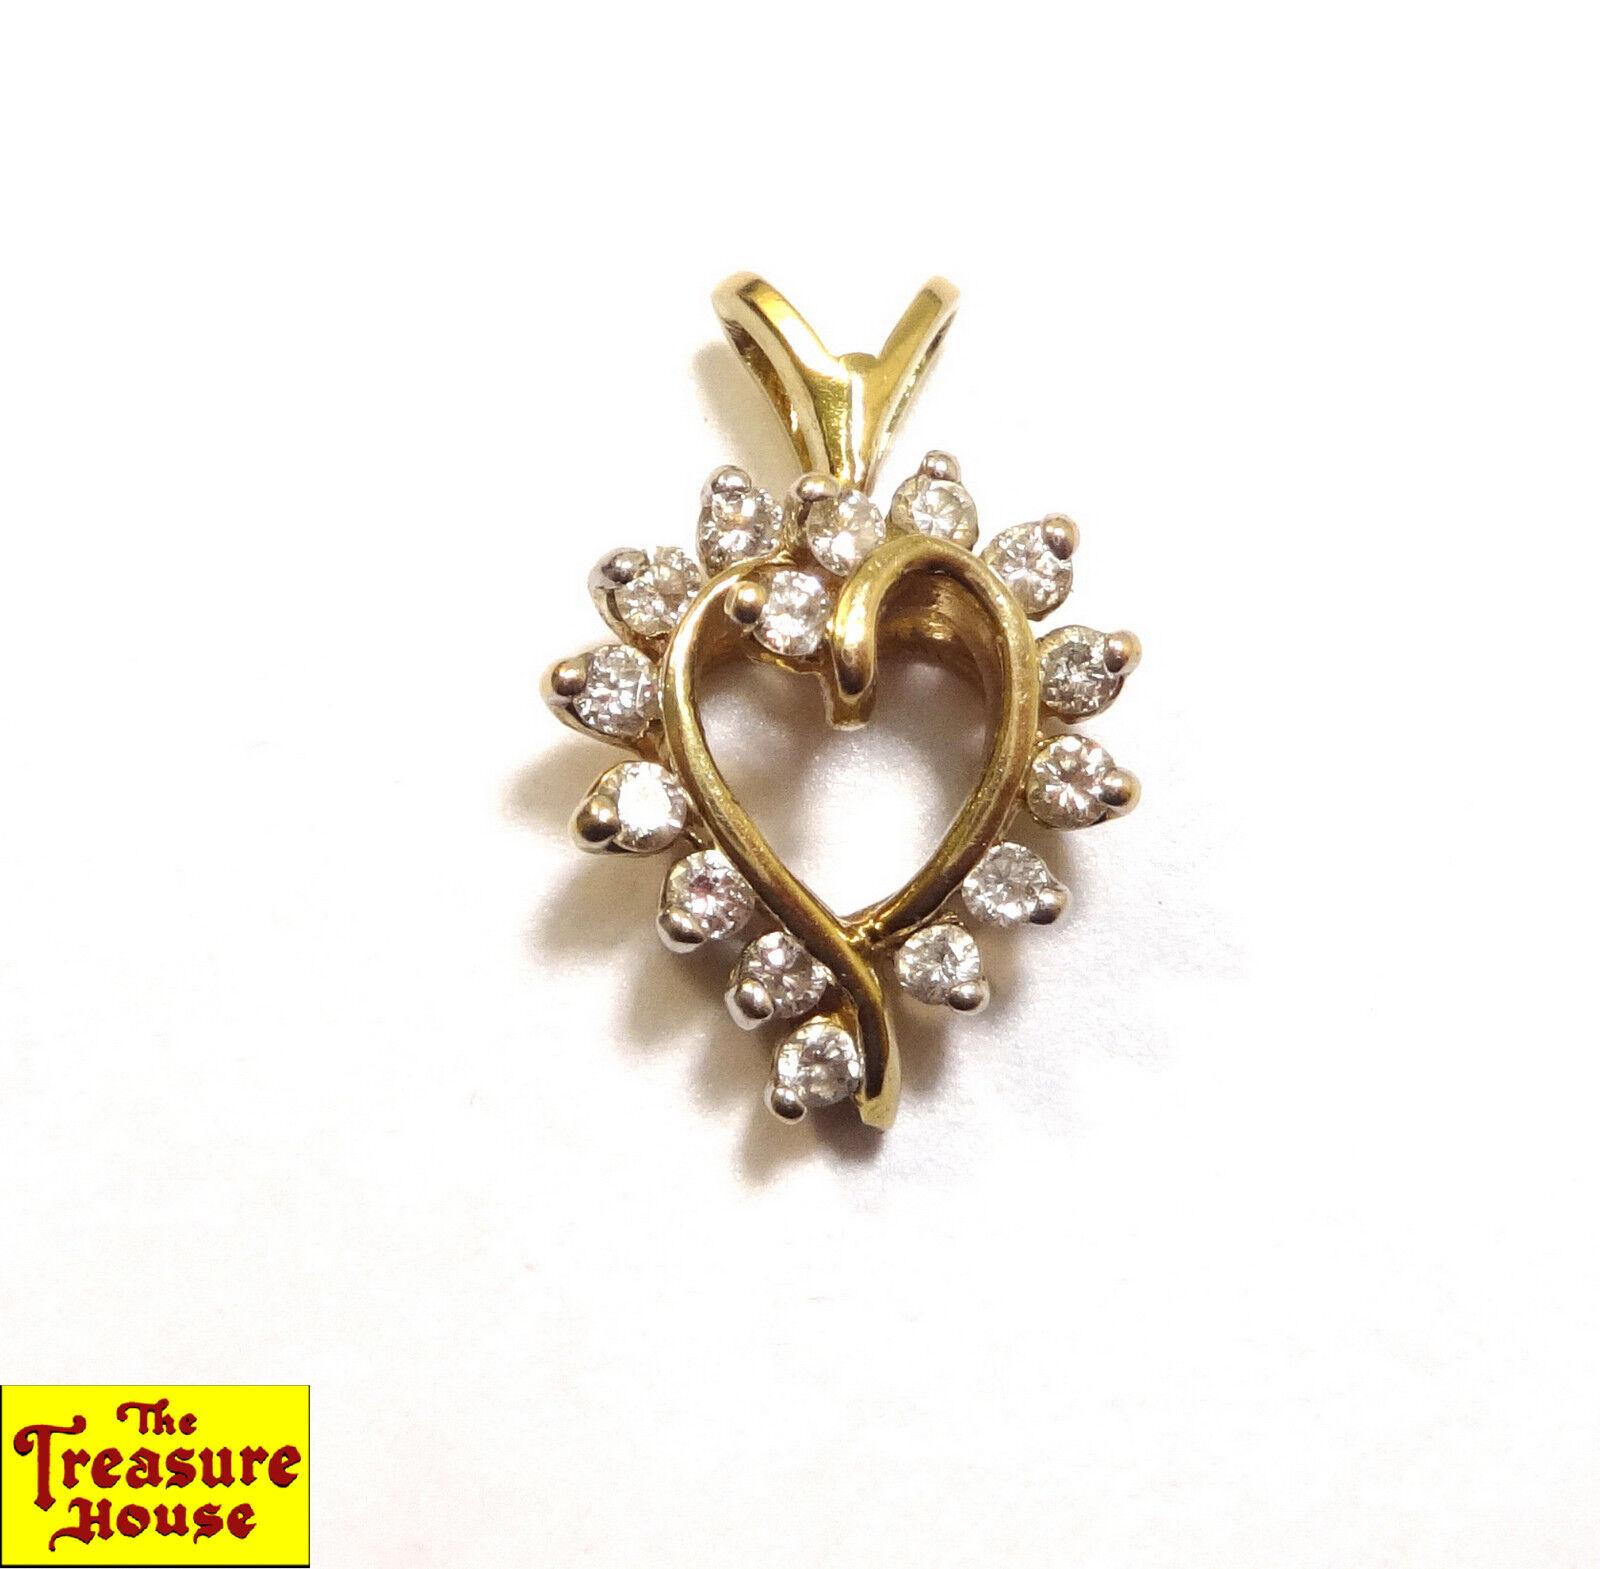 Stunning 15-Stone Solid 14K Yellow gold Diamond Open Heart Pendant Charm 1.9g